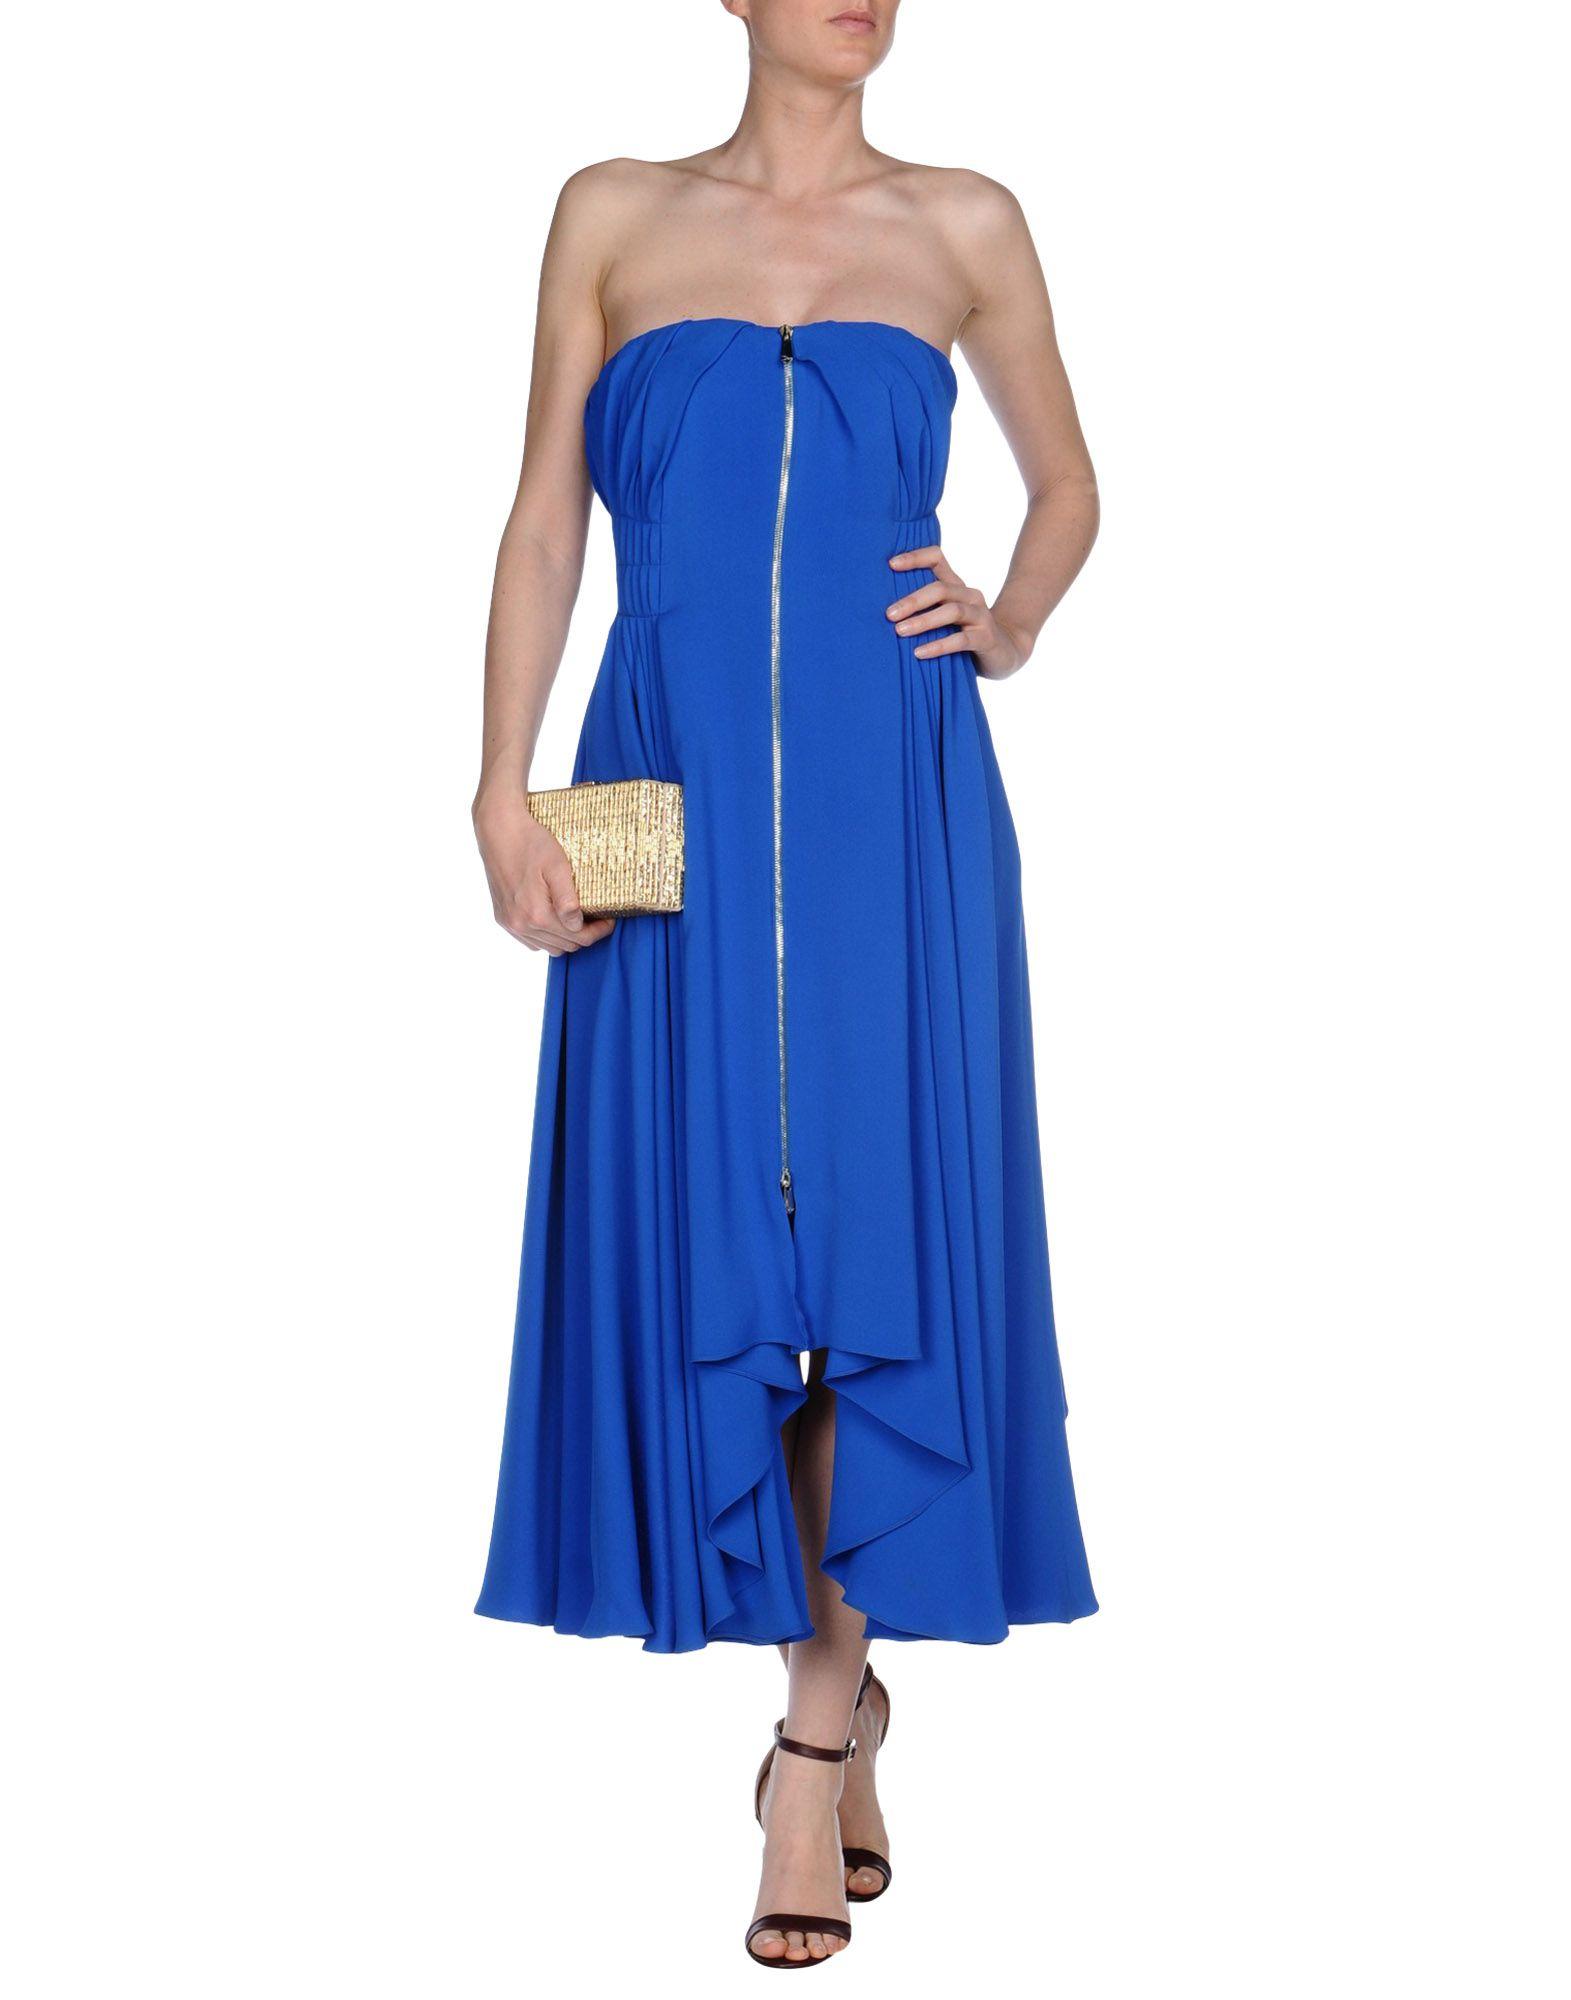 dior short dresses - photo #29